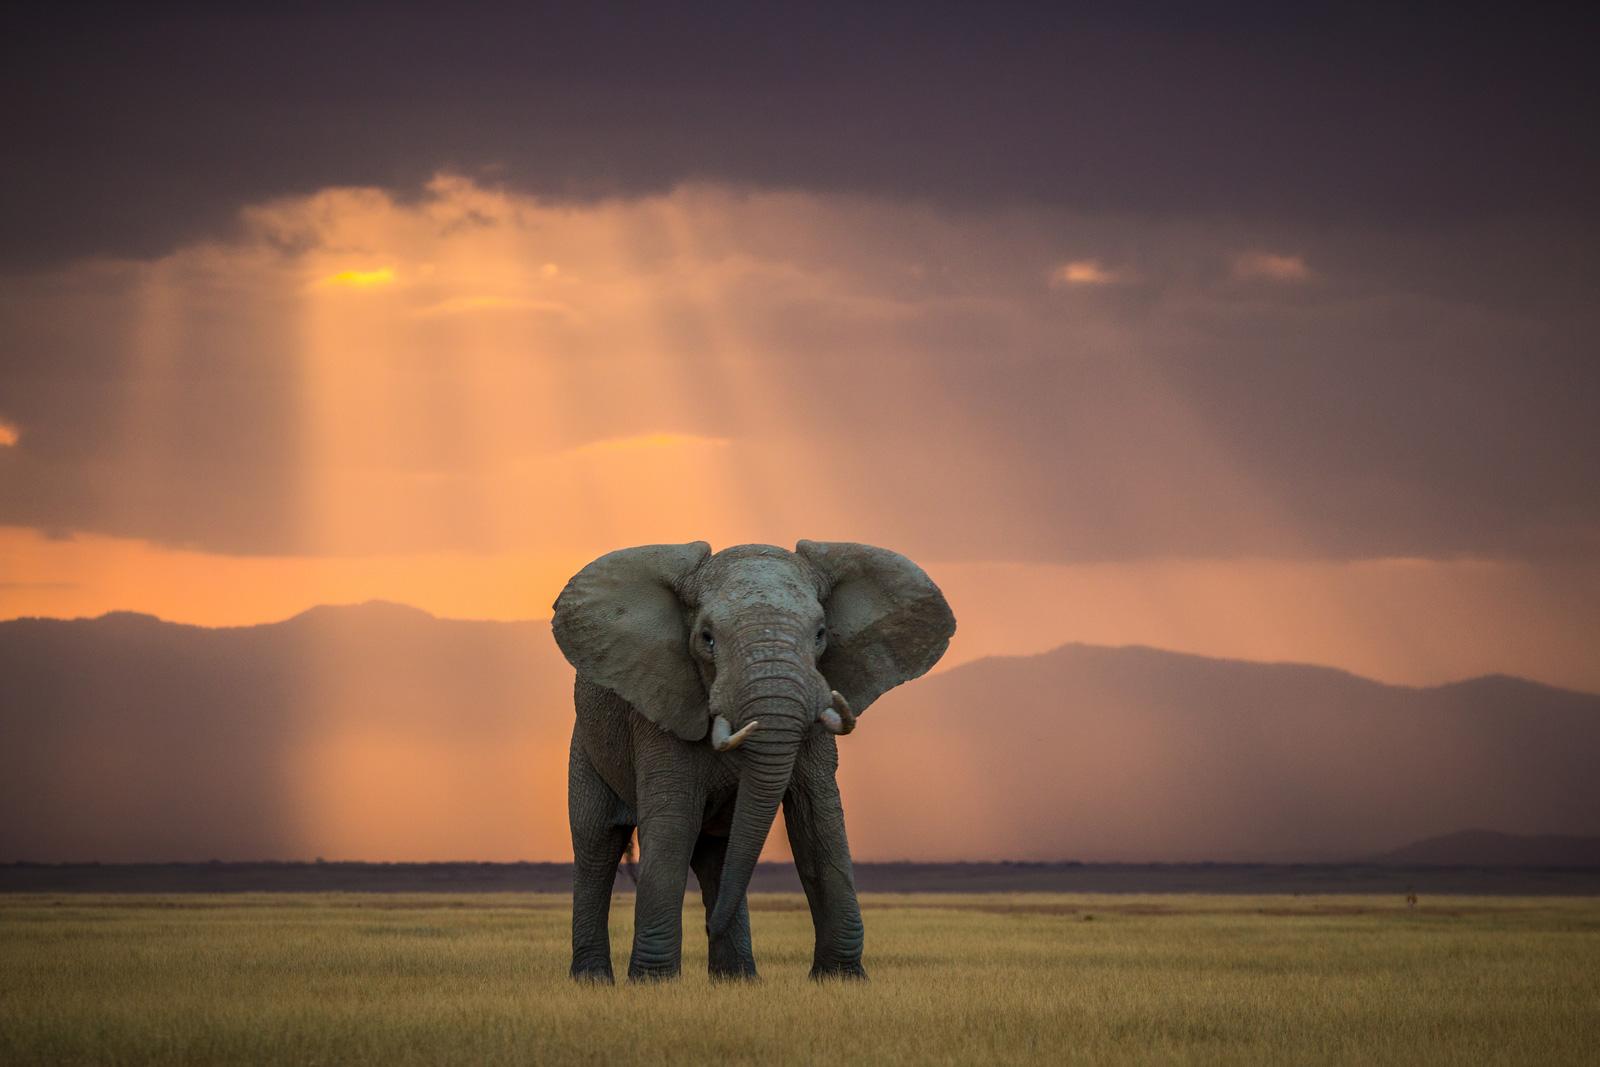 world-elephant-day-Pieter-jacobus-ras